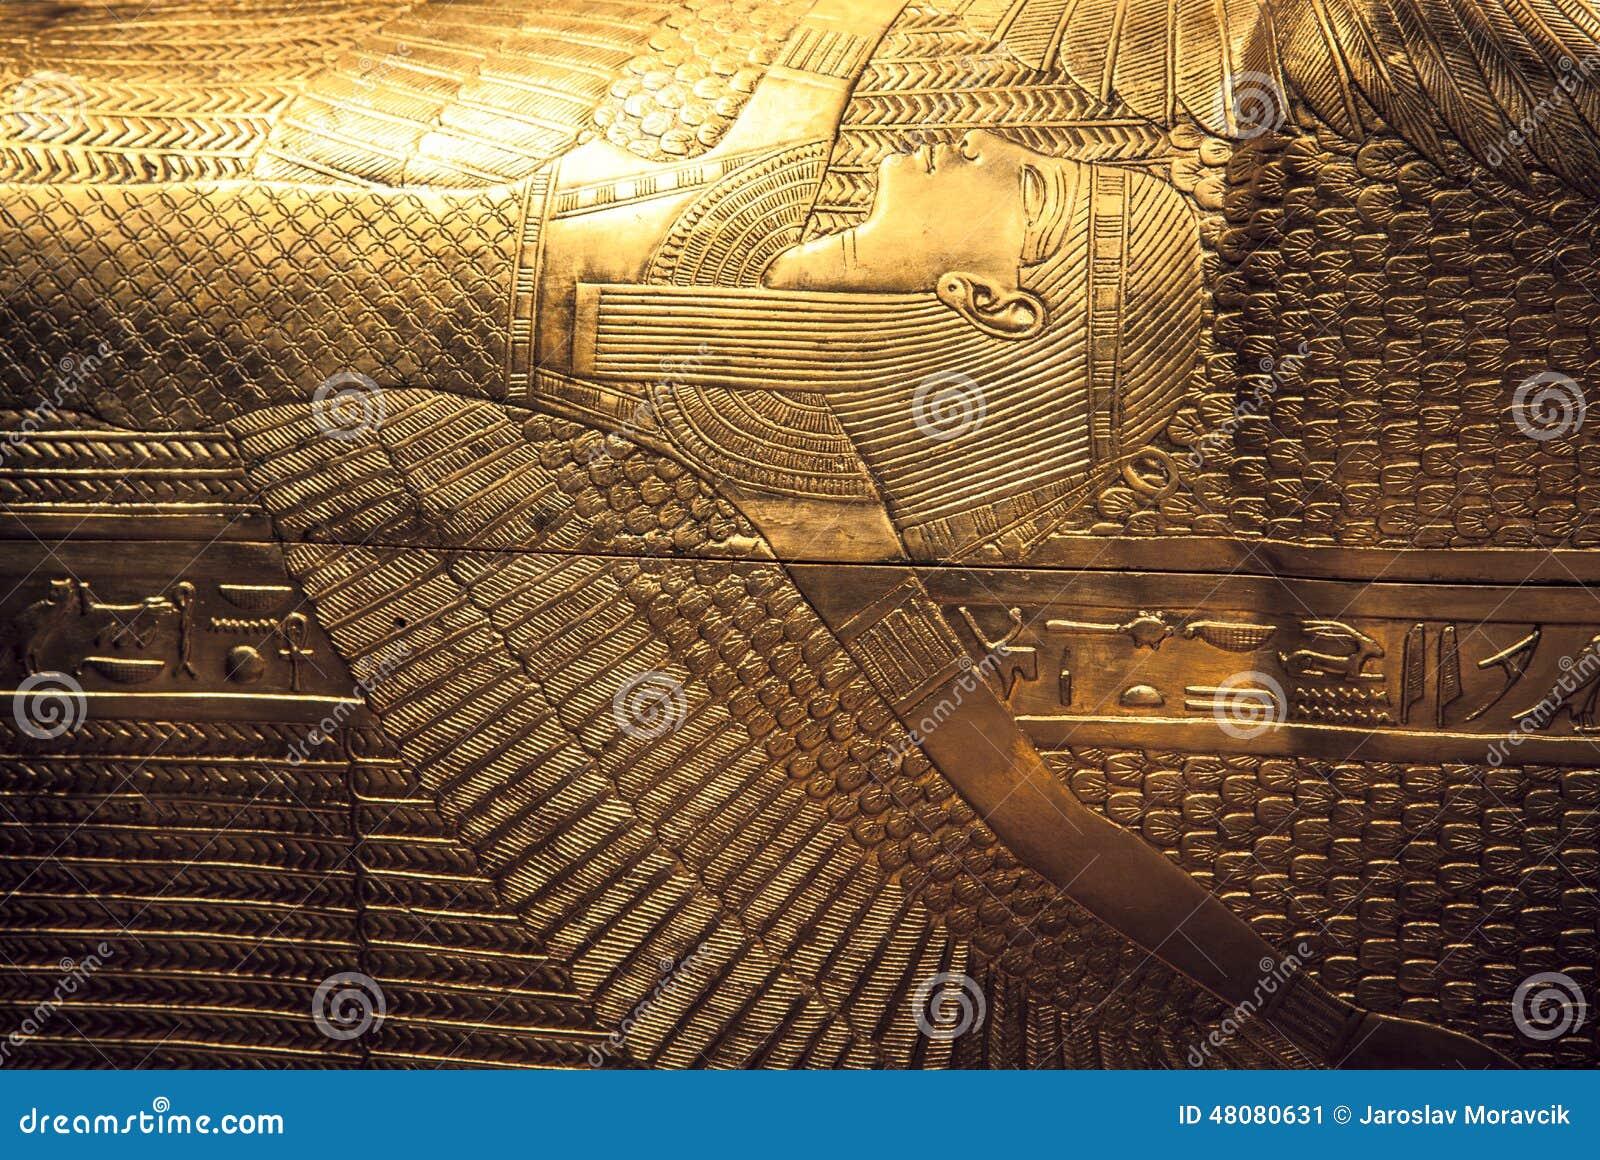 De sarcofaag van Tutankhamun